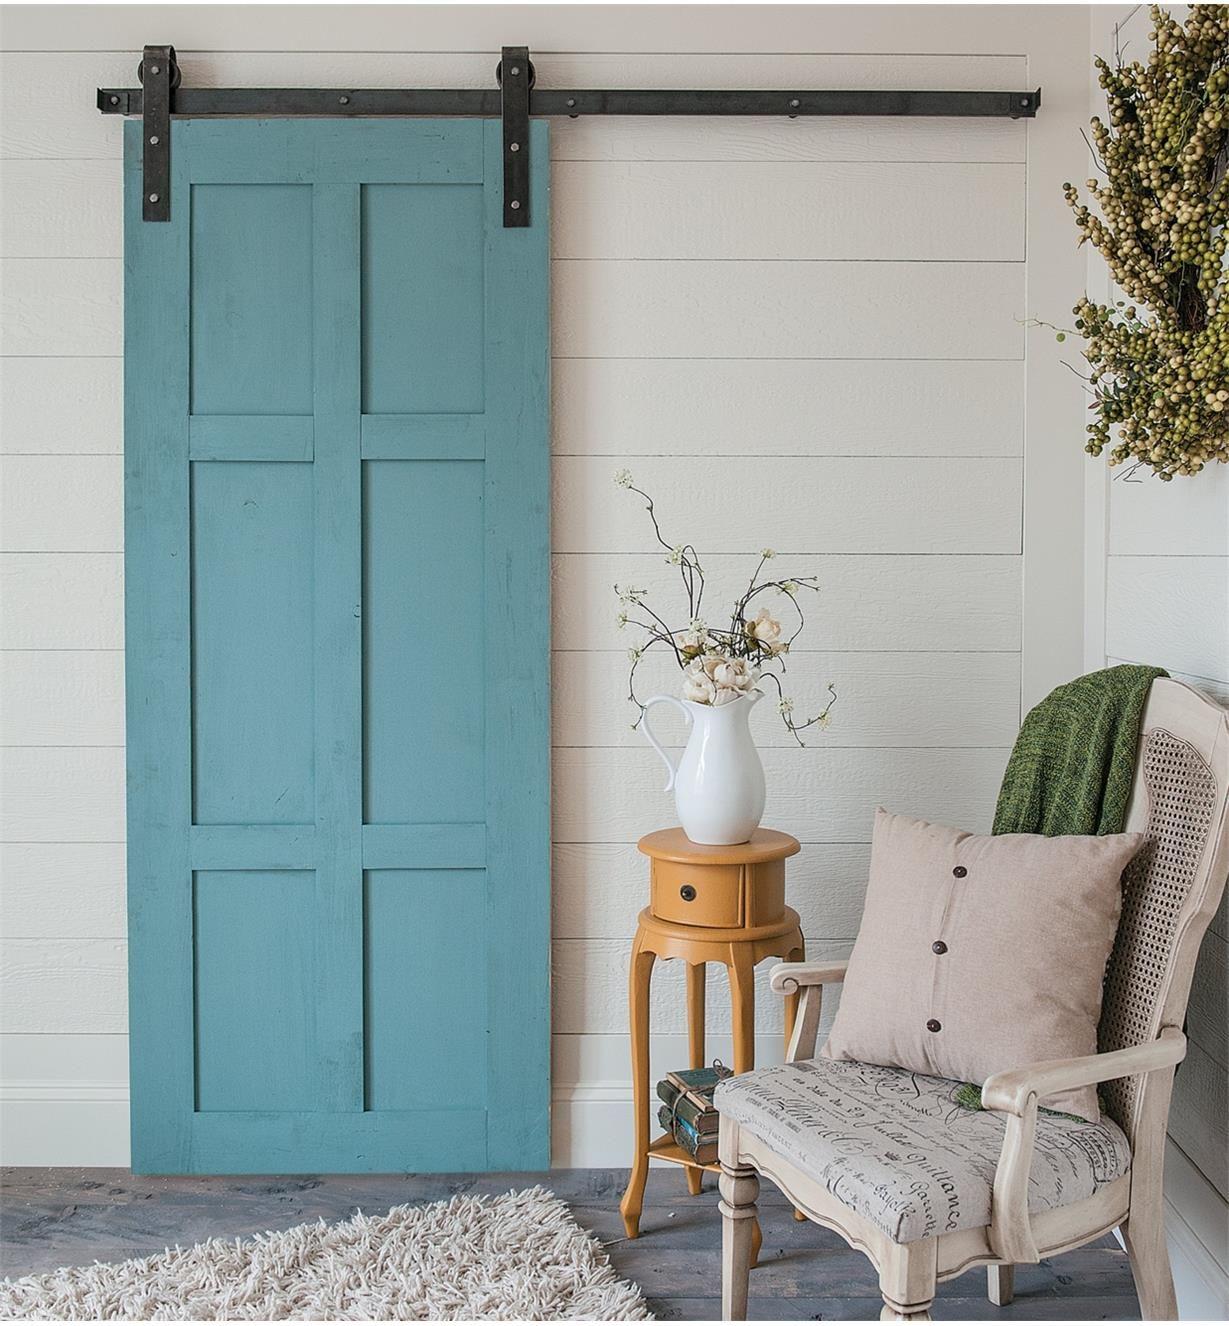 Classic Face-Mount Barn-Style Door Hardware